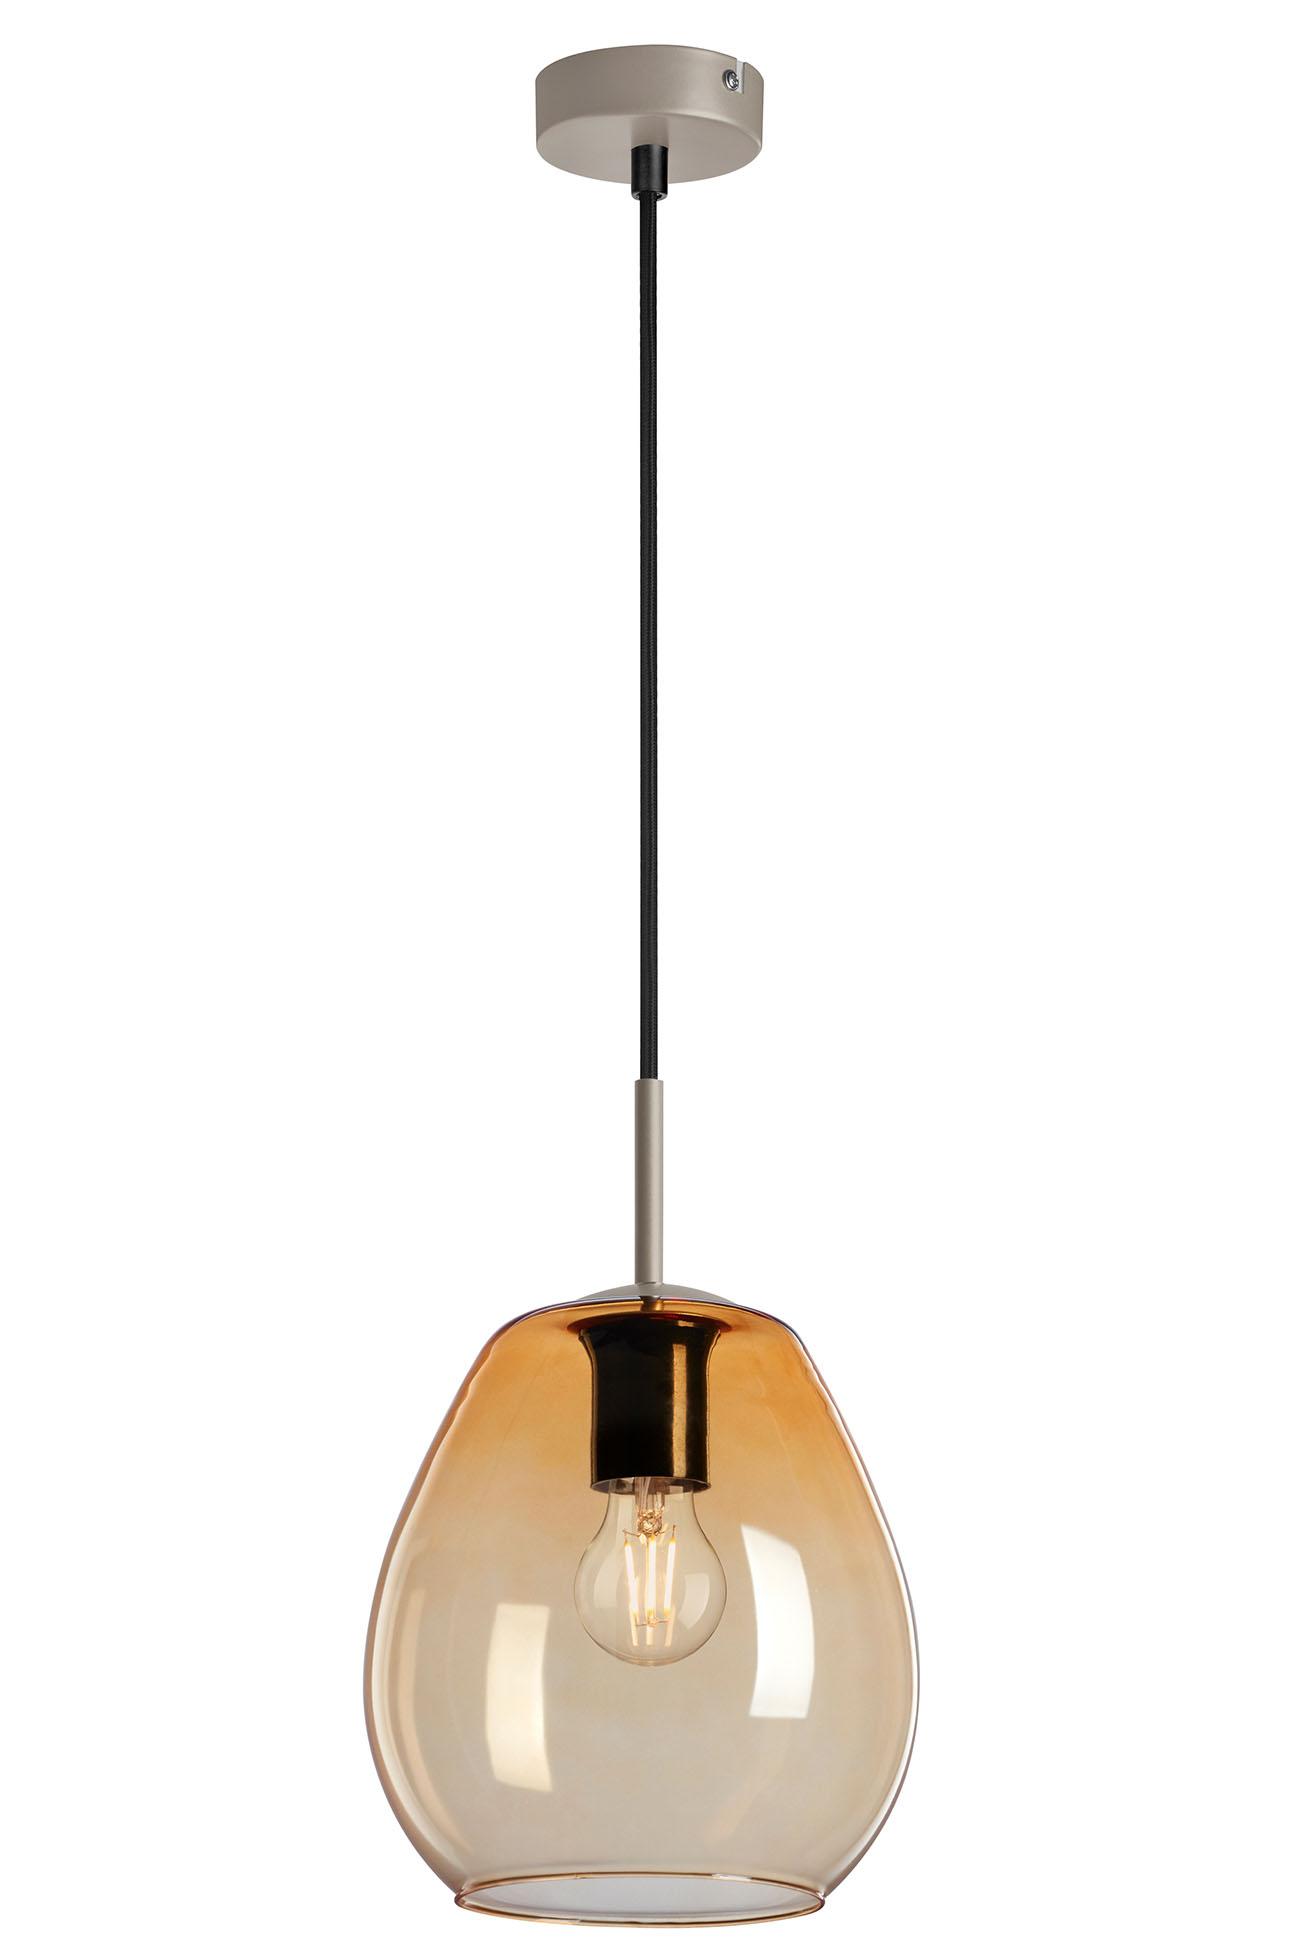 Pendelleuchte, Ø 22 cm, max. 40 W, Amber-Gold